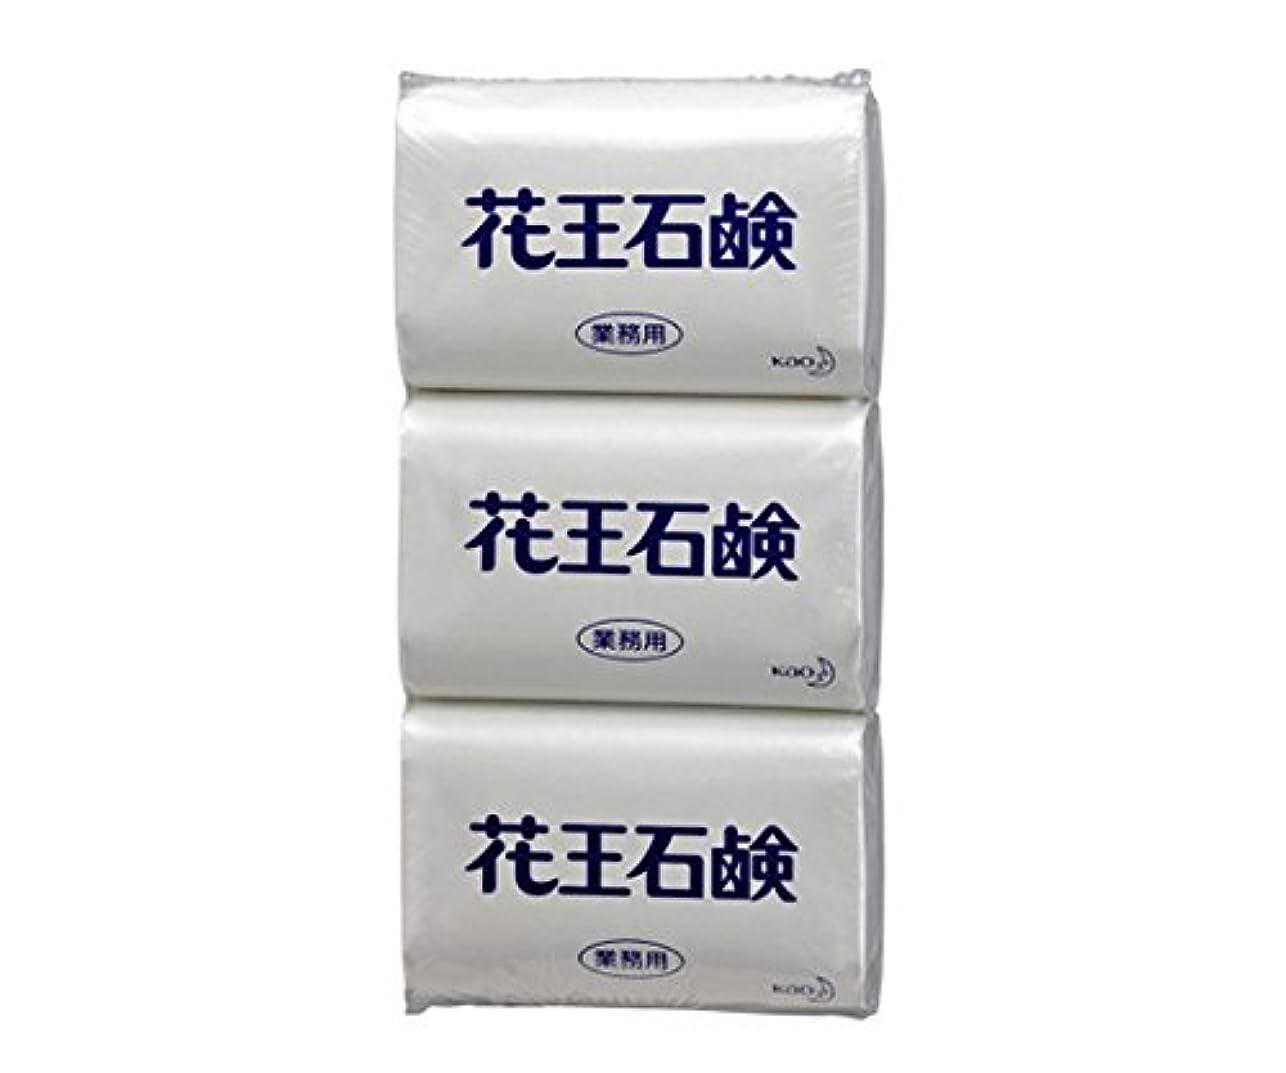 費用大脳バブル花王1-2756-11石鹸85G